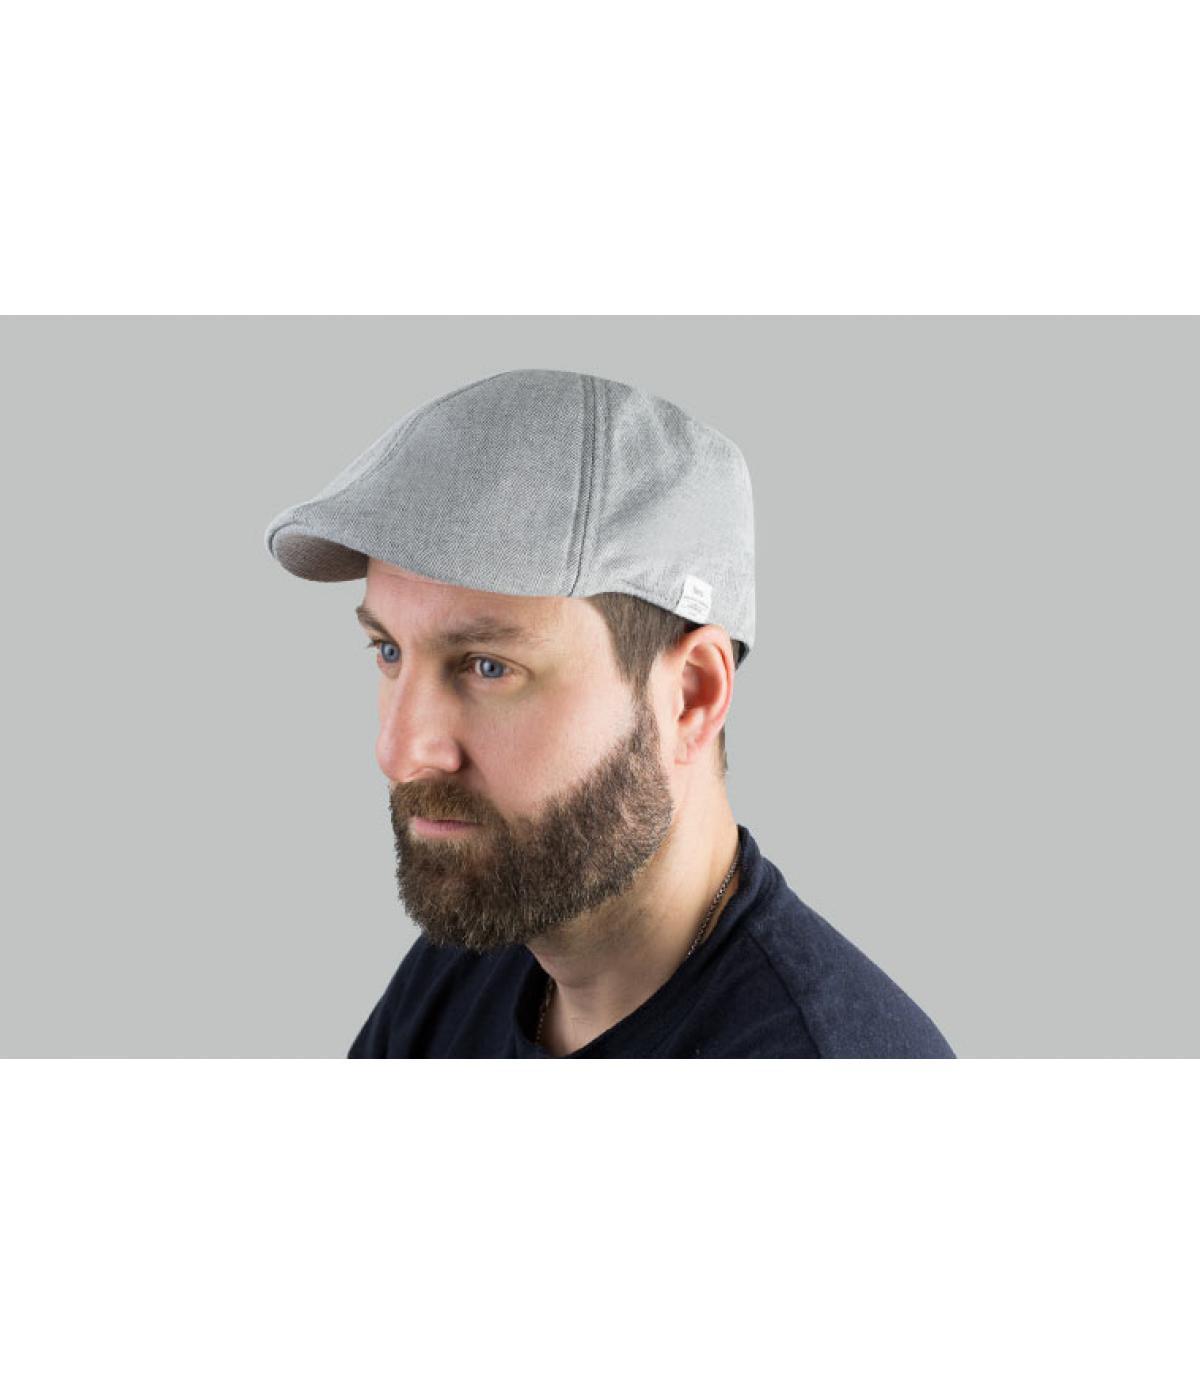 gorra duckbill algodón gris